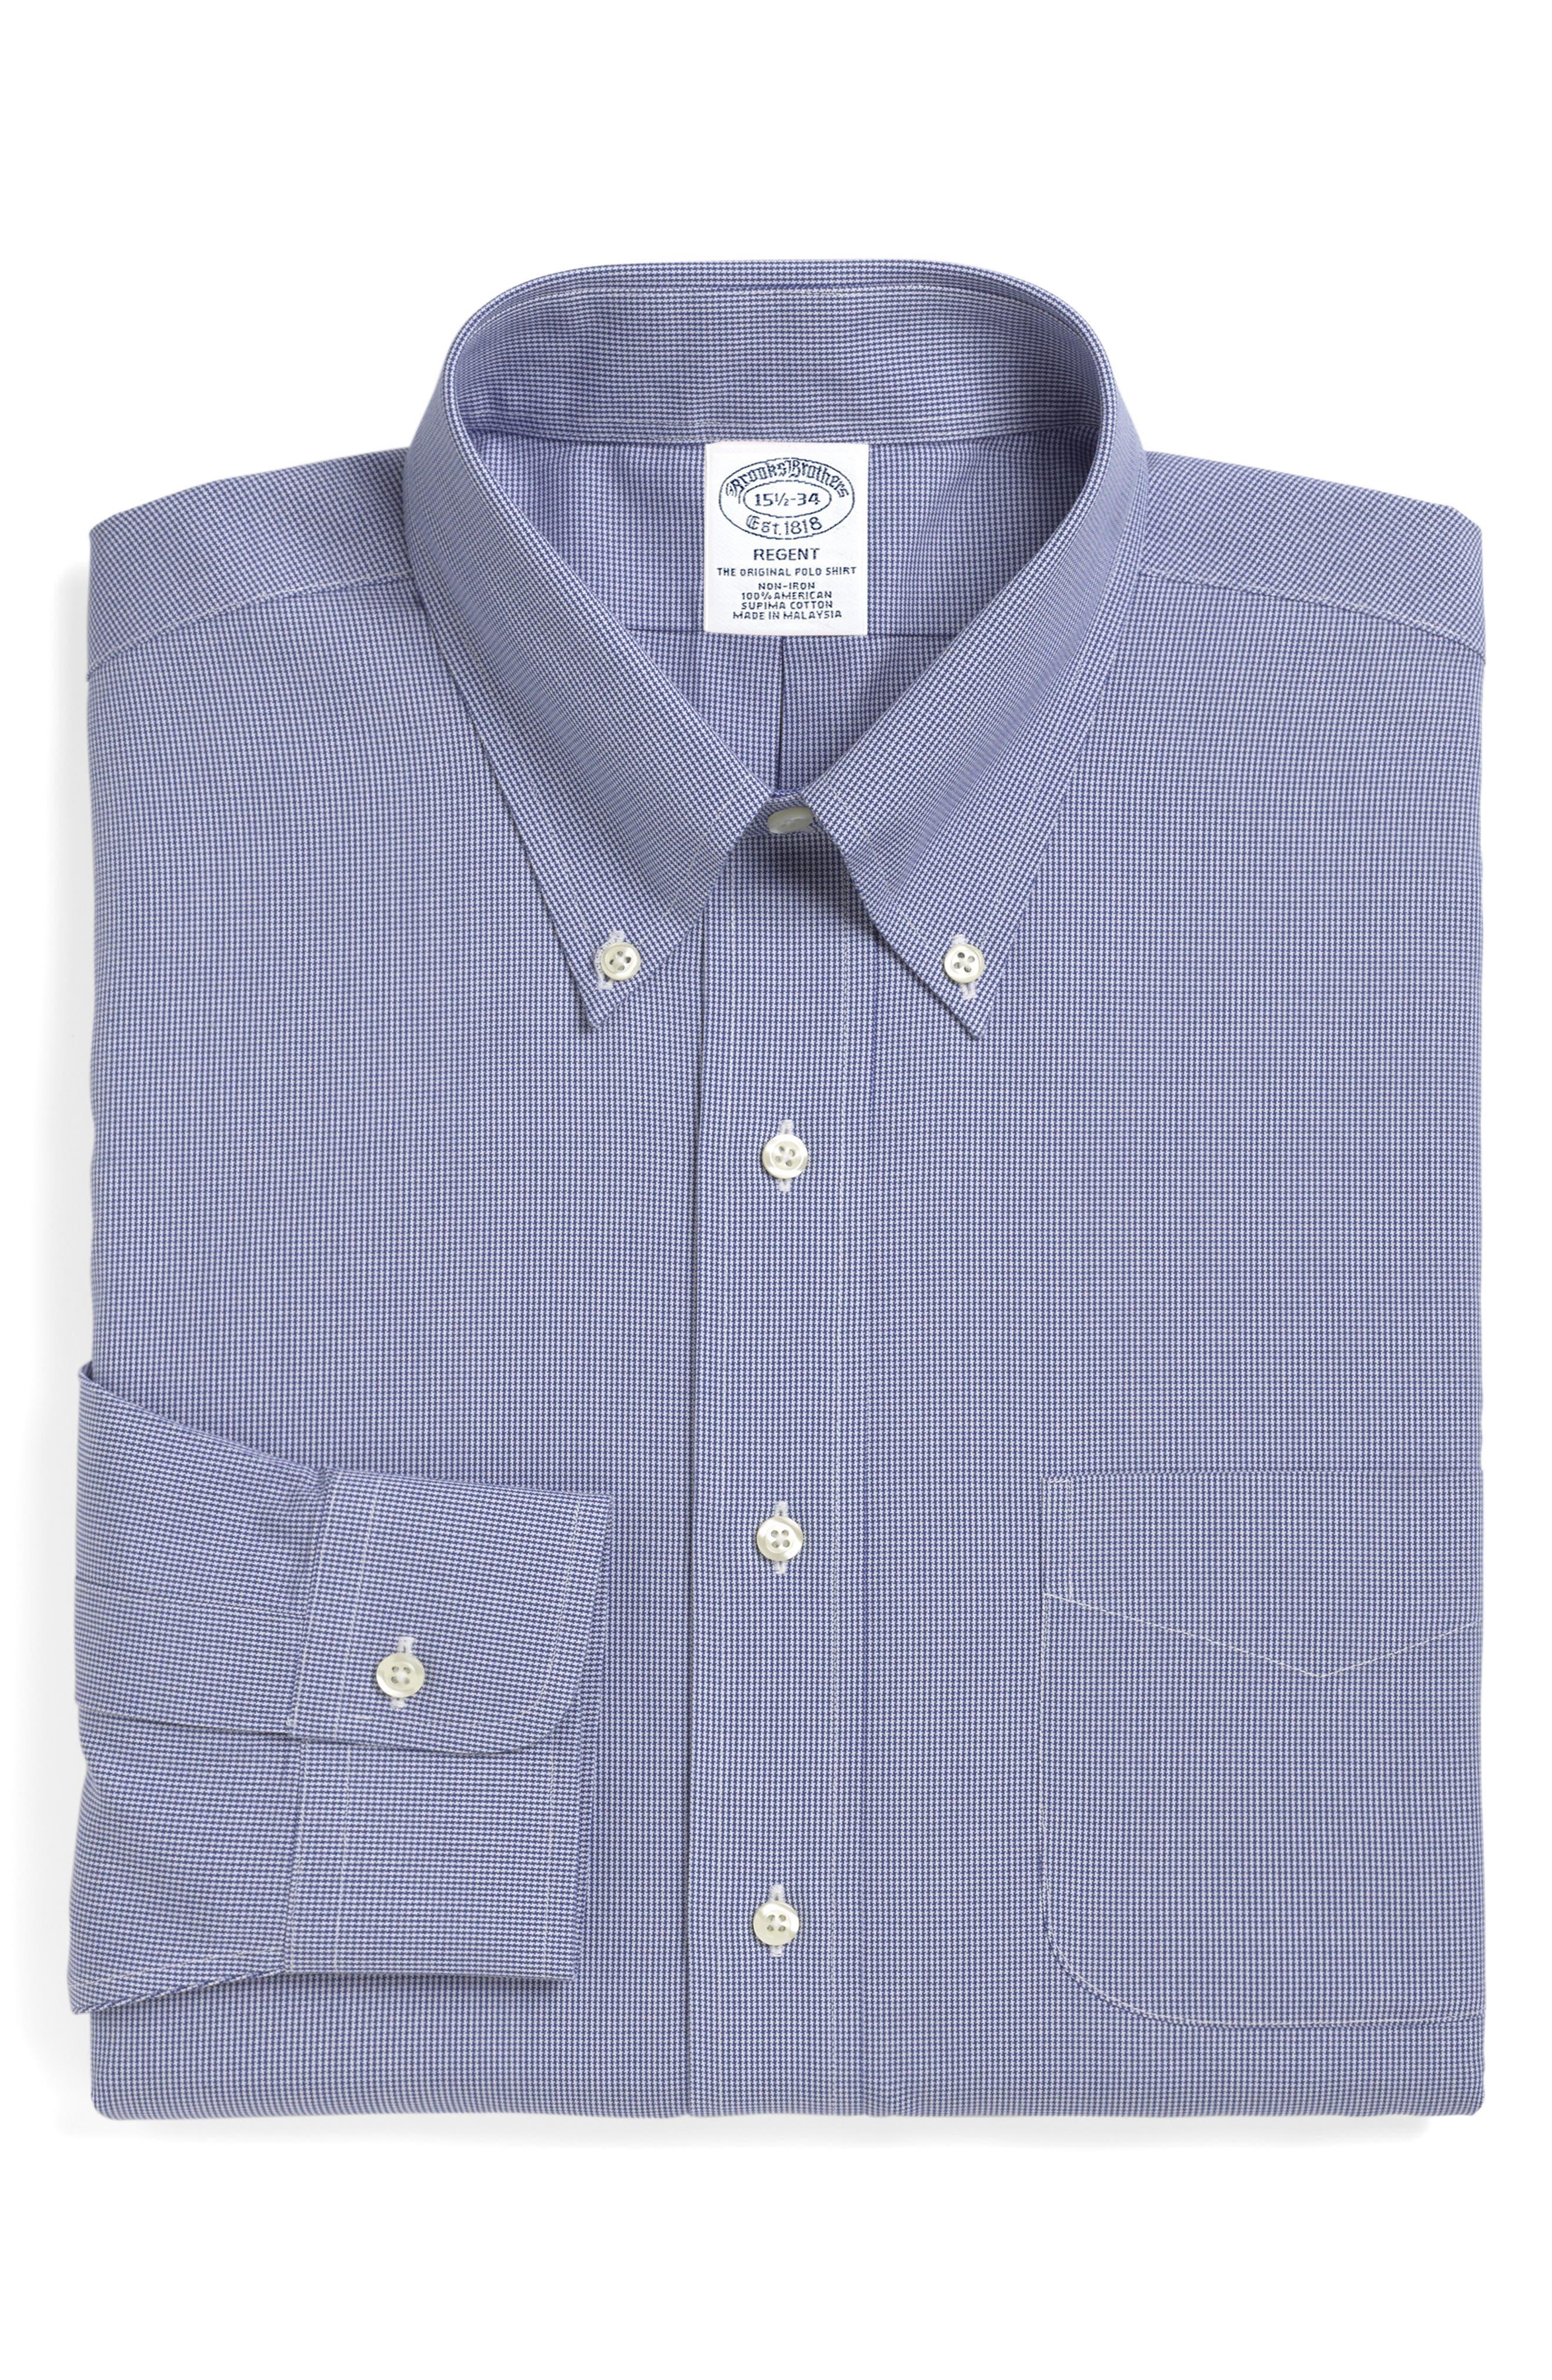 Regular Fit Houndstooth Dress Shirt,                         Main,                         color, BLUE